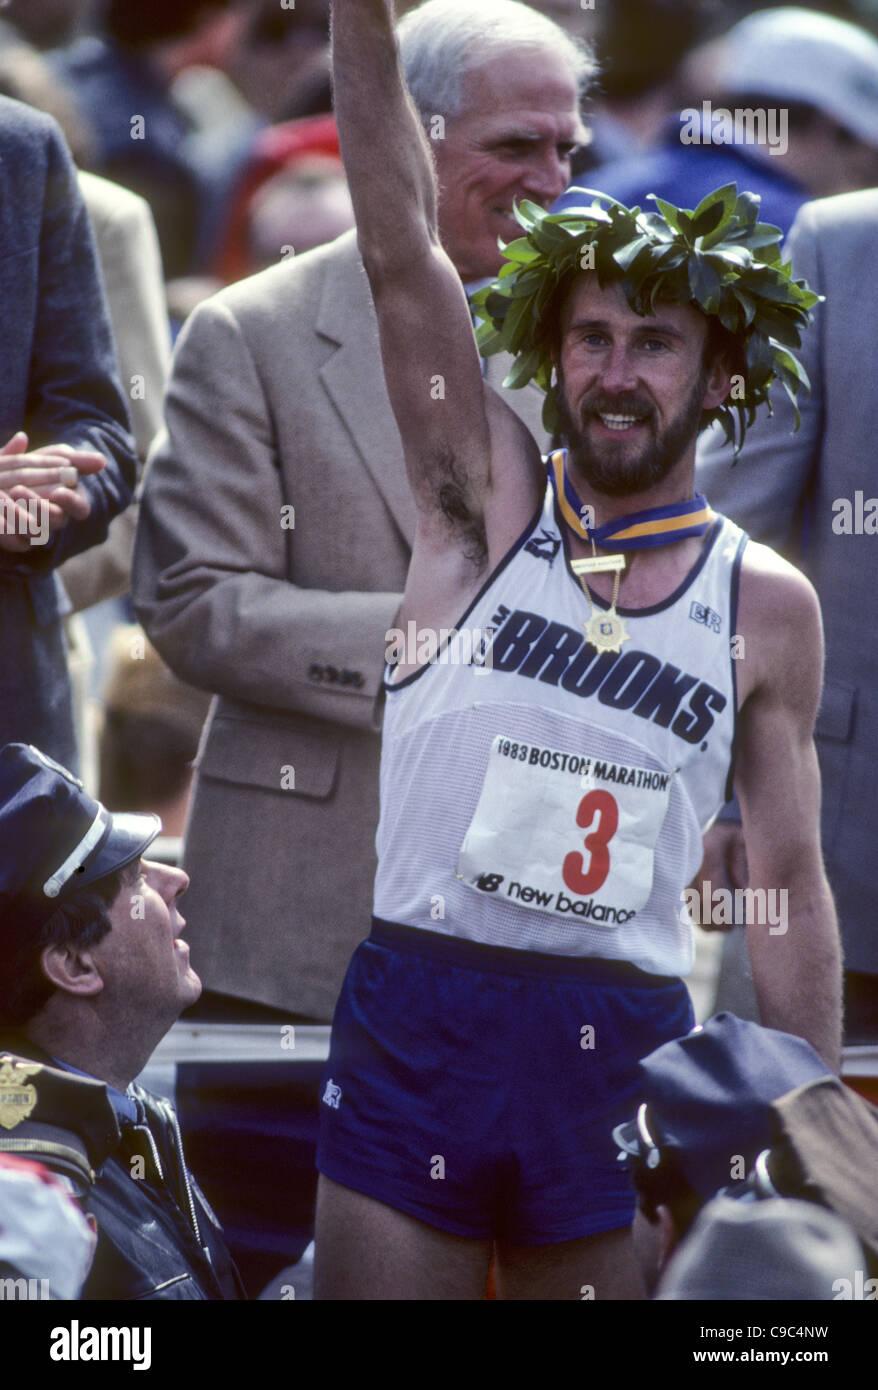 Greg Meyer (USA) winner of the 1983 Boston. Marathon - Stock Image